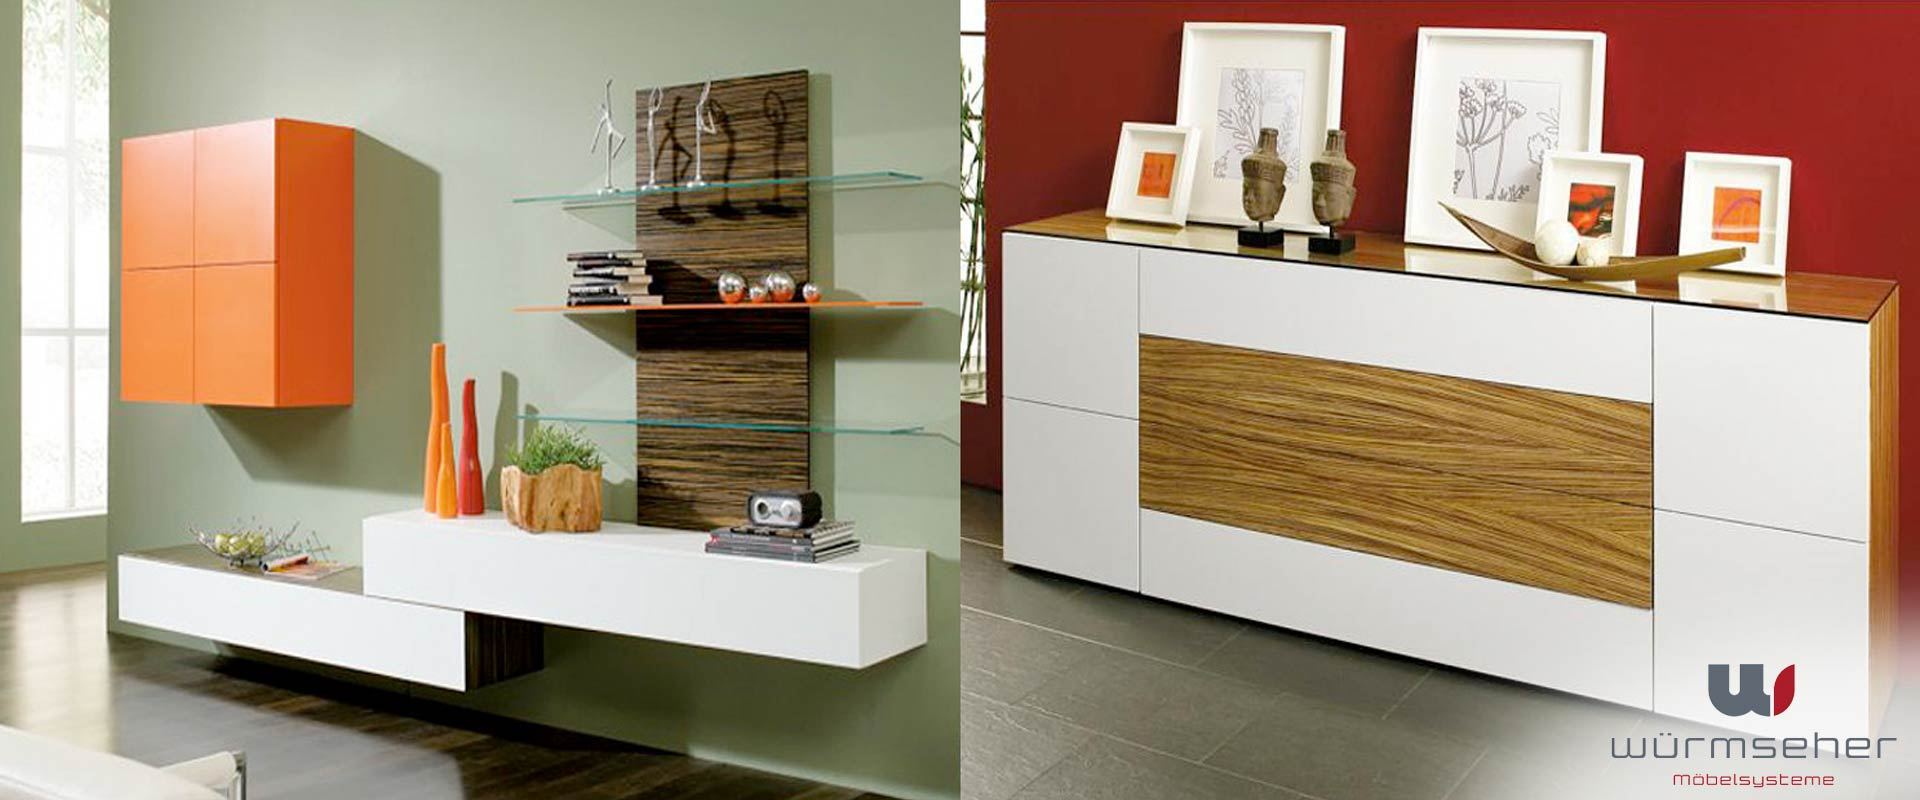 domeyer m bel und k chen m bel domeyer. Black Bedroom Furniture Sets. Home Design Ideas